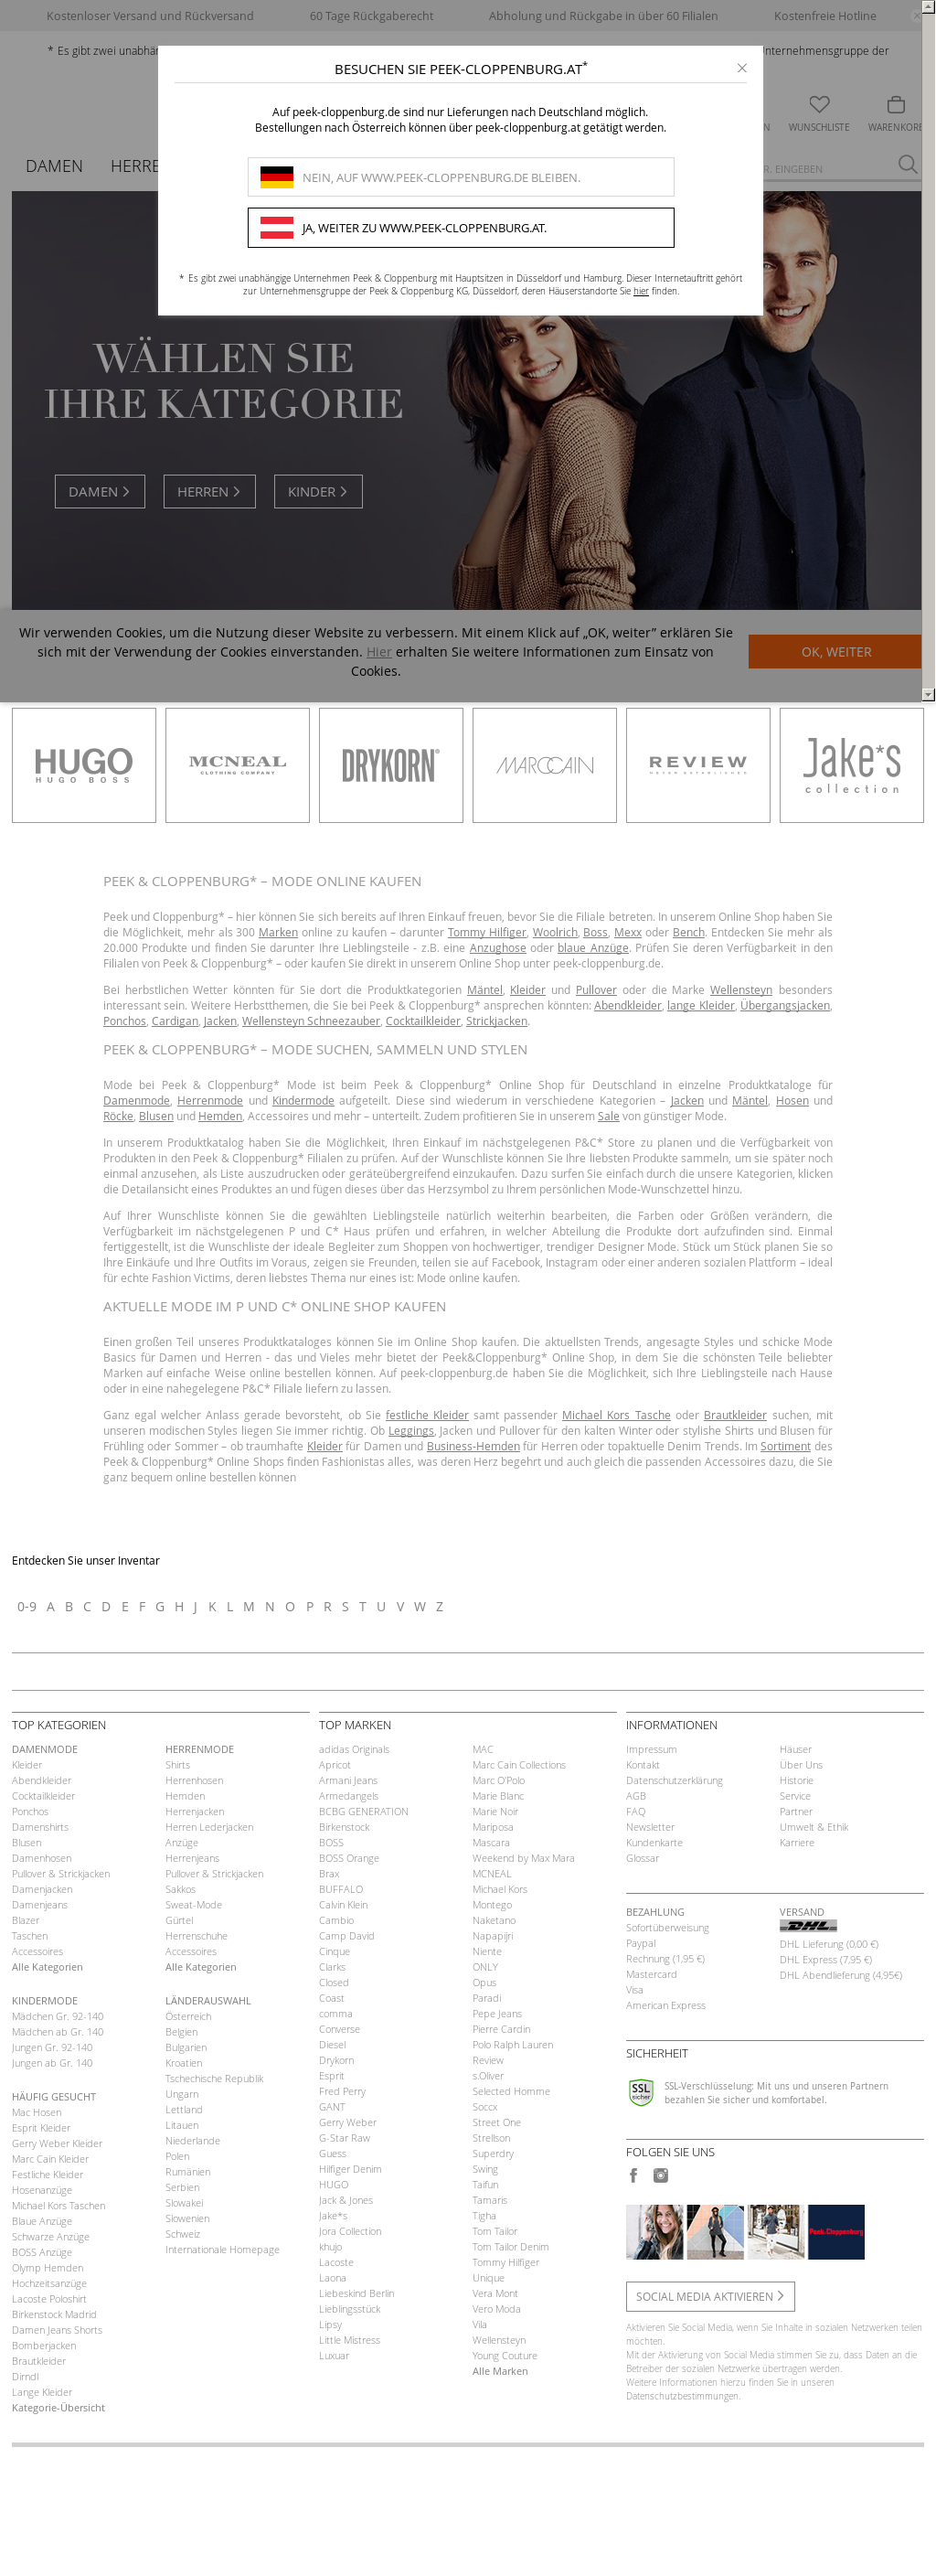 joseph janard's competitors, revenue, number of employees